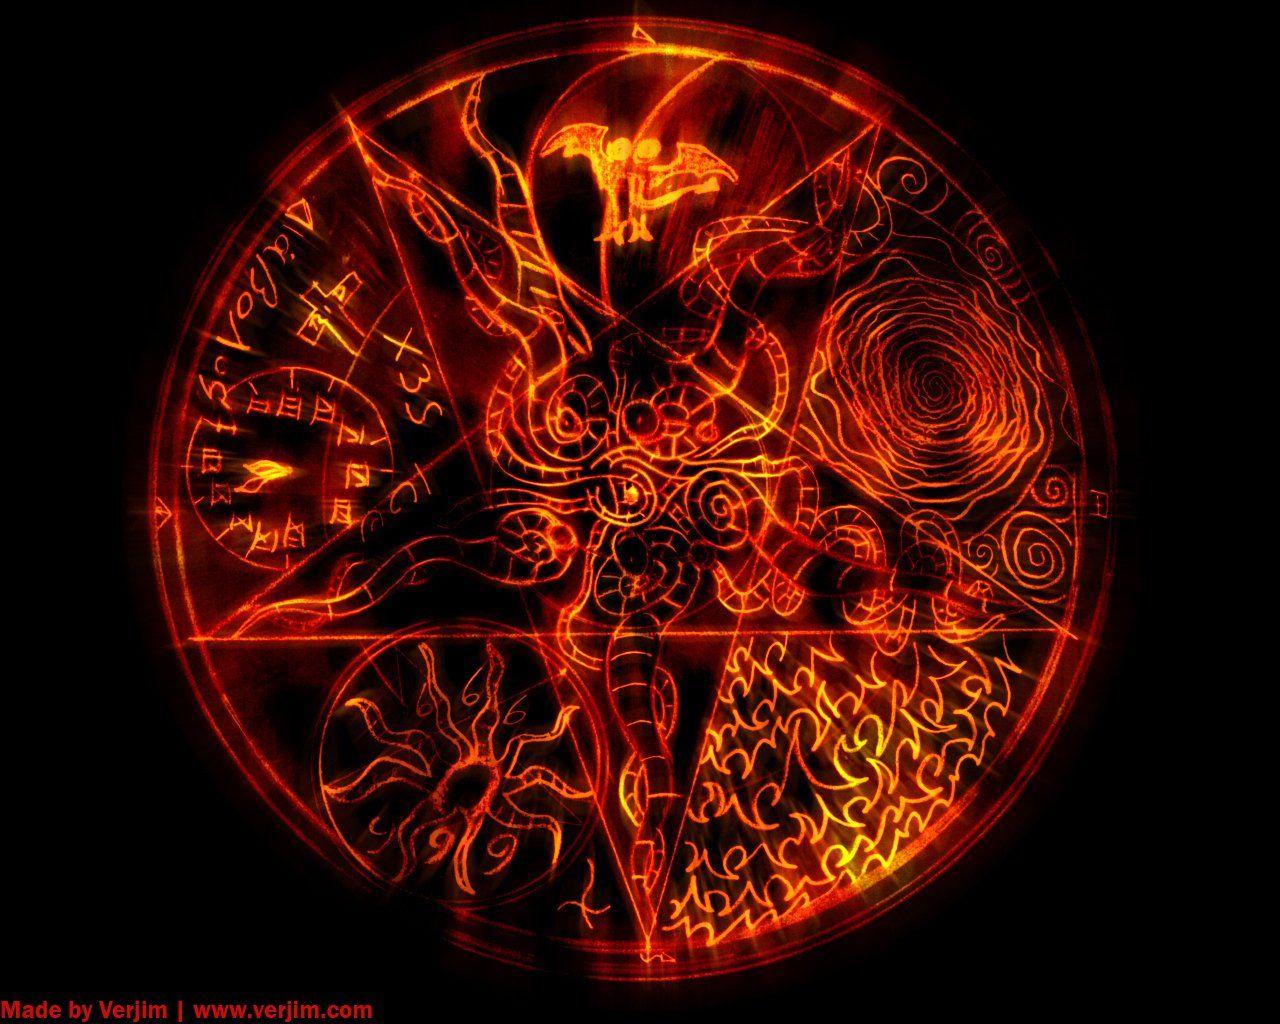 Fire pentagram.jpg 1,280×1,024 pixels THE VICTOR